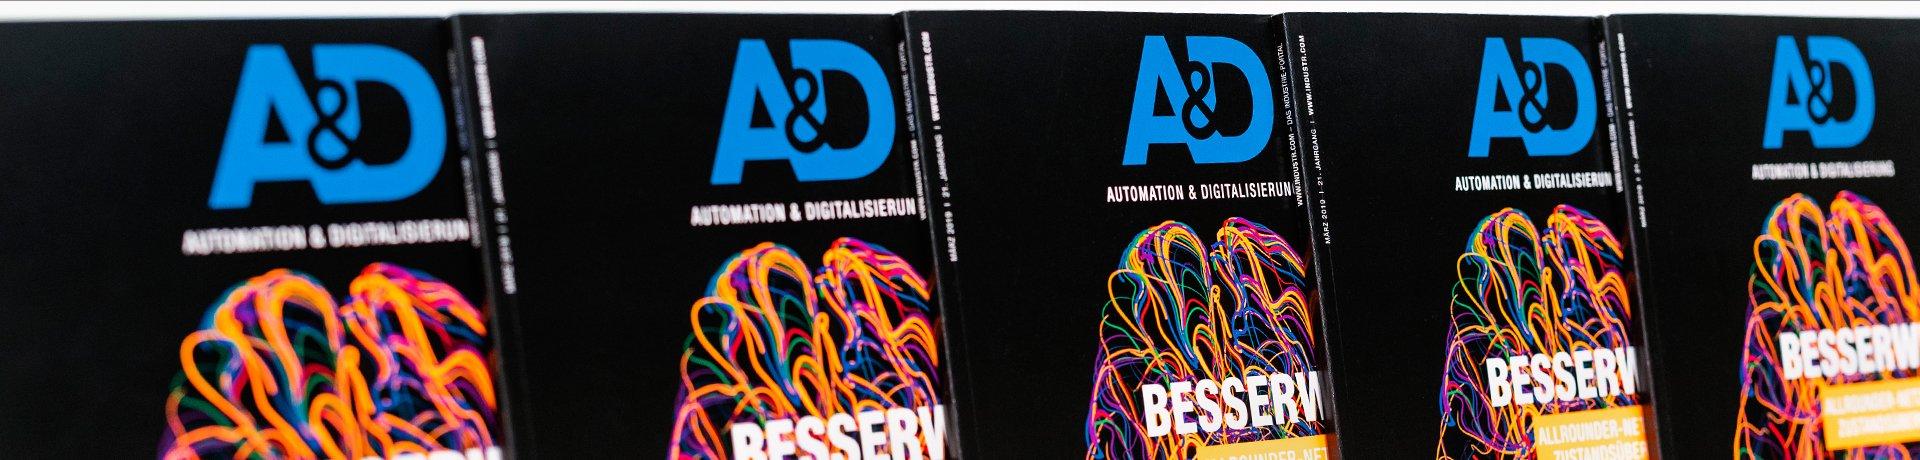 A&D – Automation & Digitalisierung